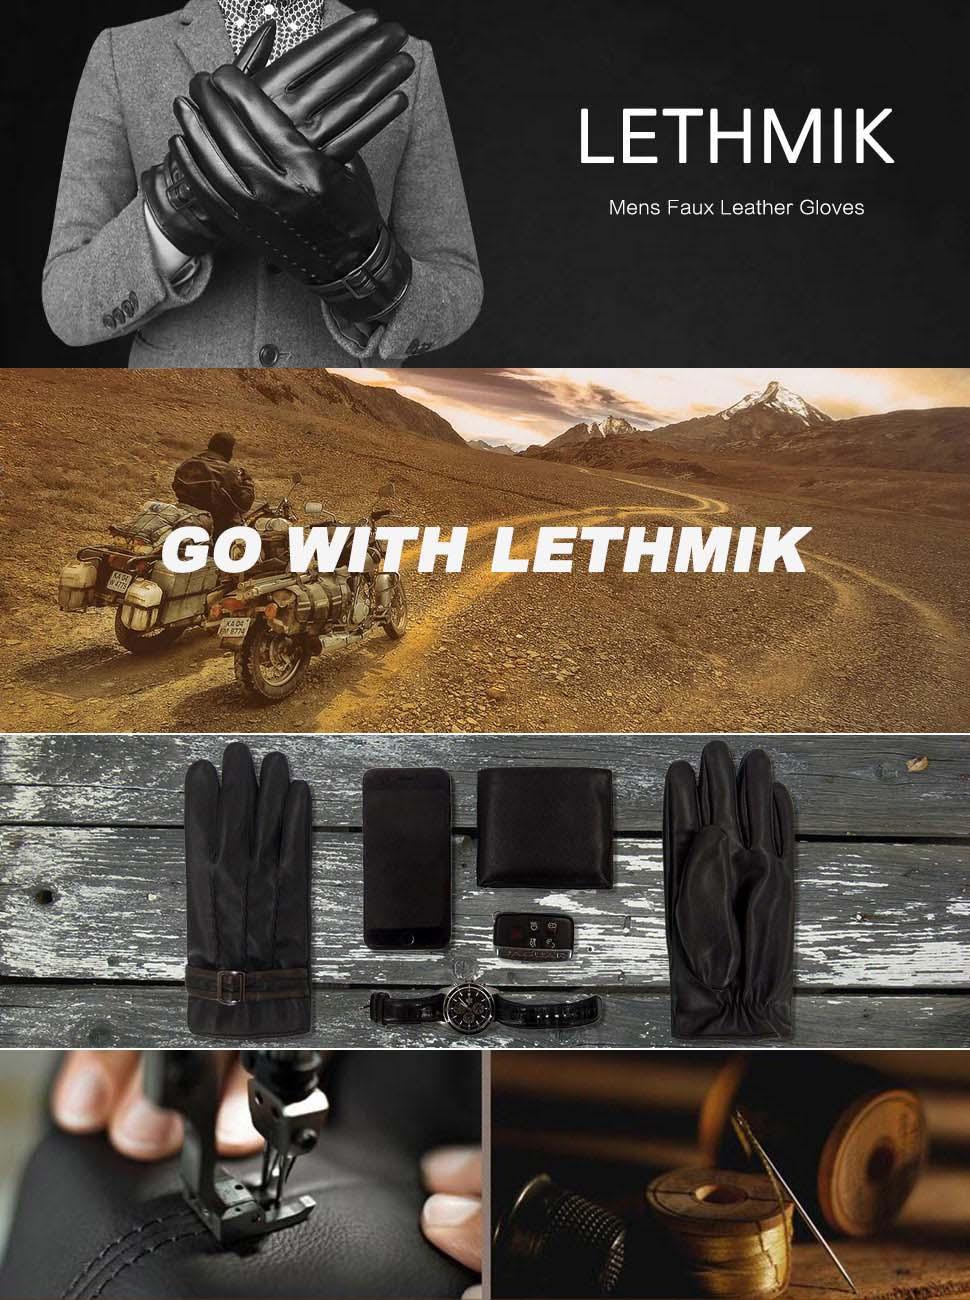 Fake leather driving gloves - Lethmik Leather Gloves